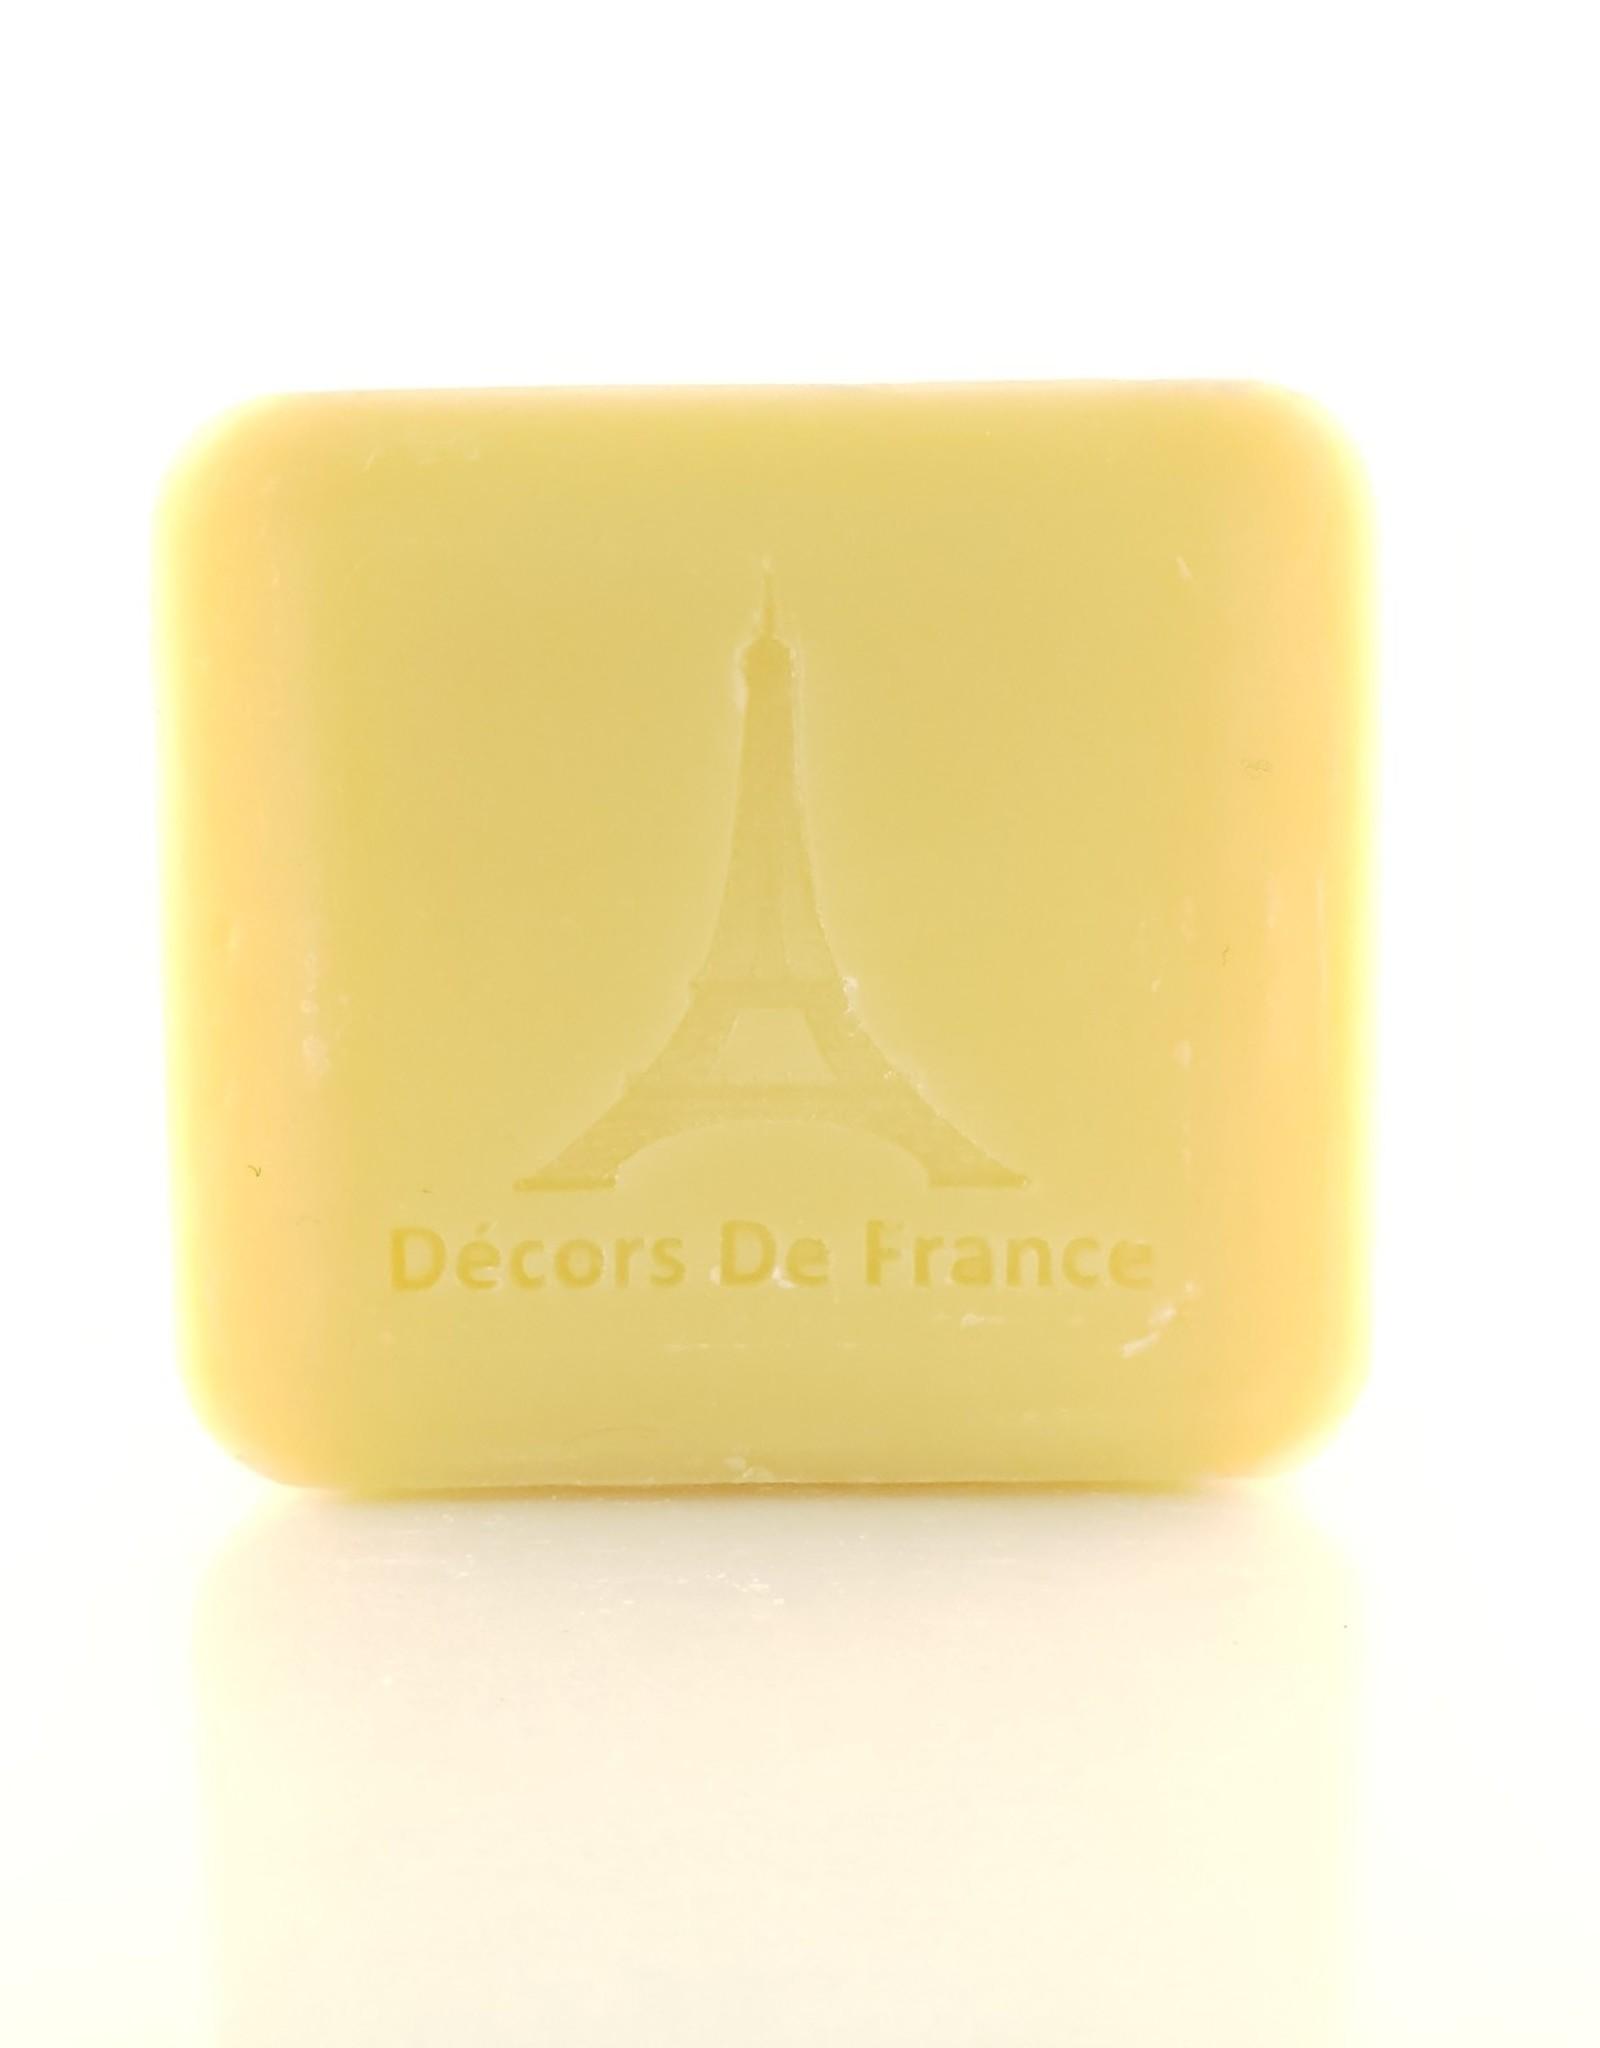 Honey 100g Square Soap